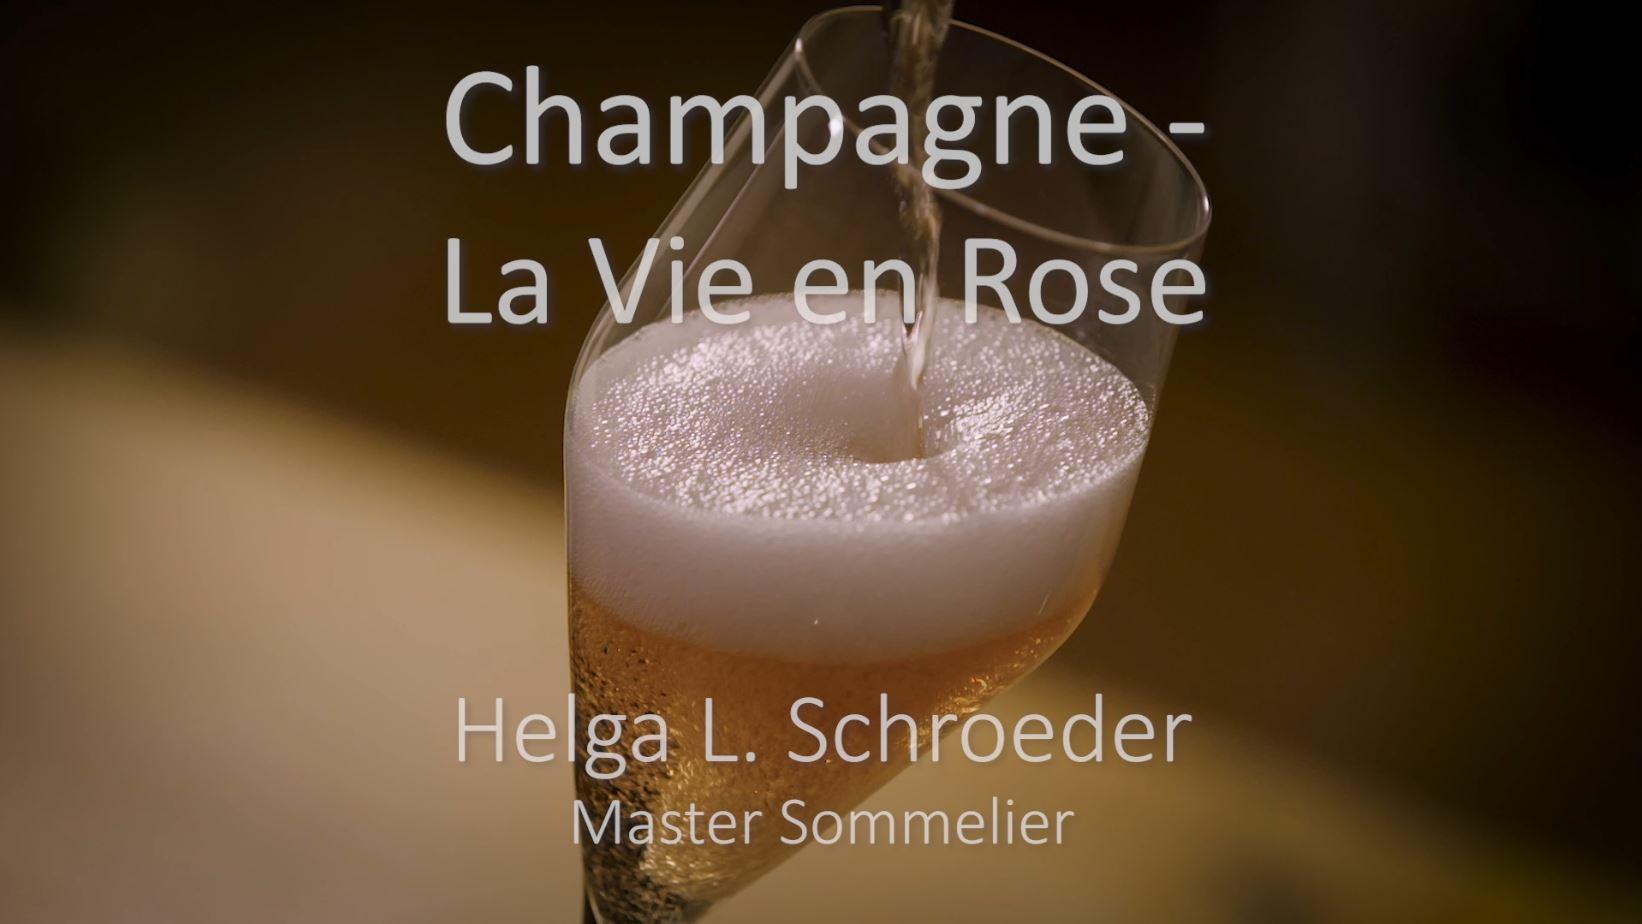 Champagne_La_Vie_en_Rose_Helga_Schroeder_MS